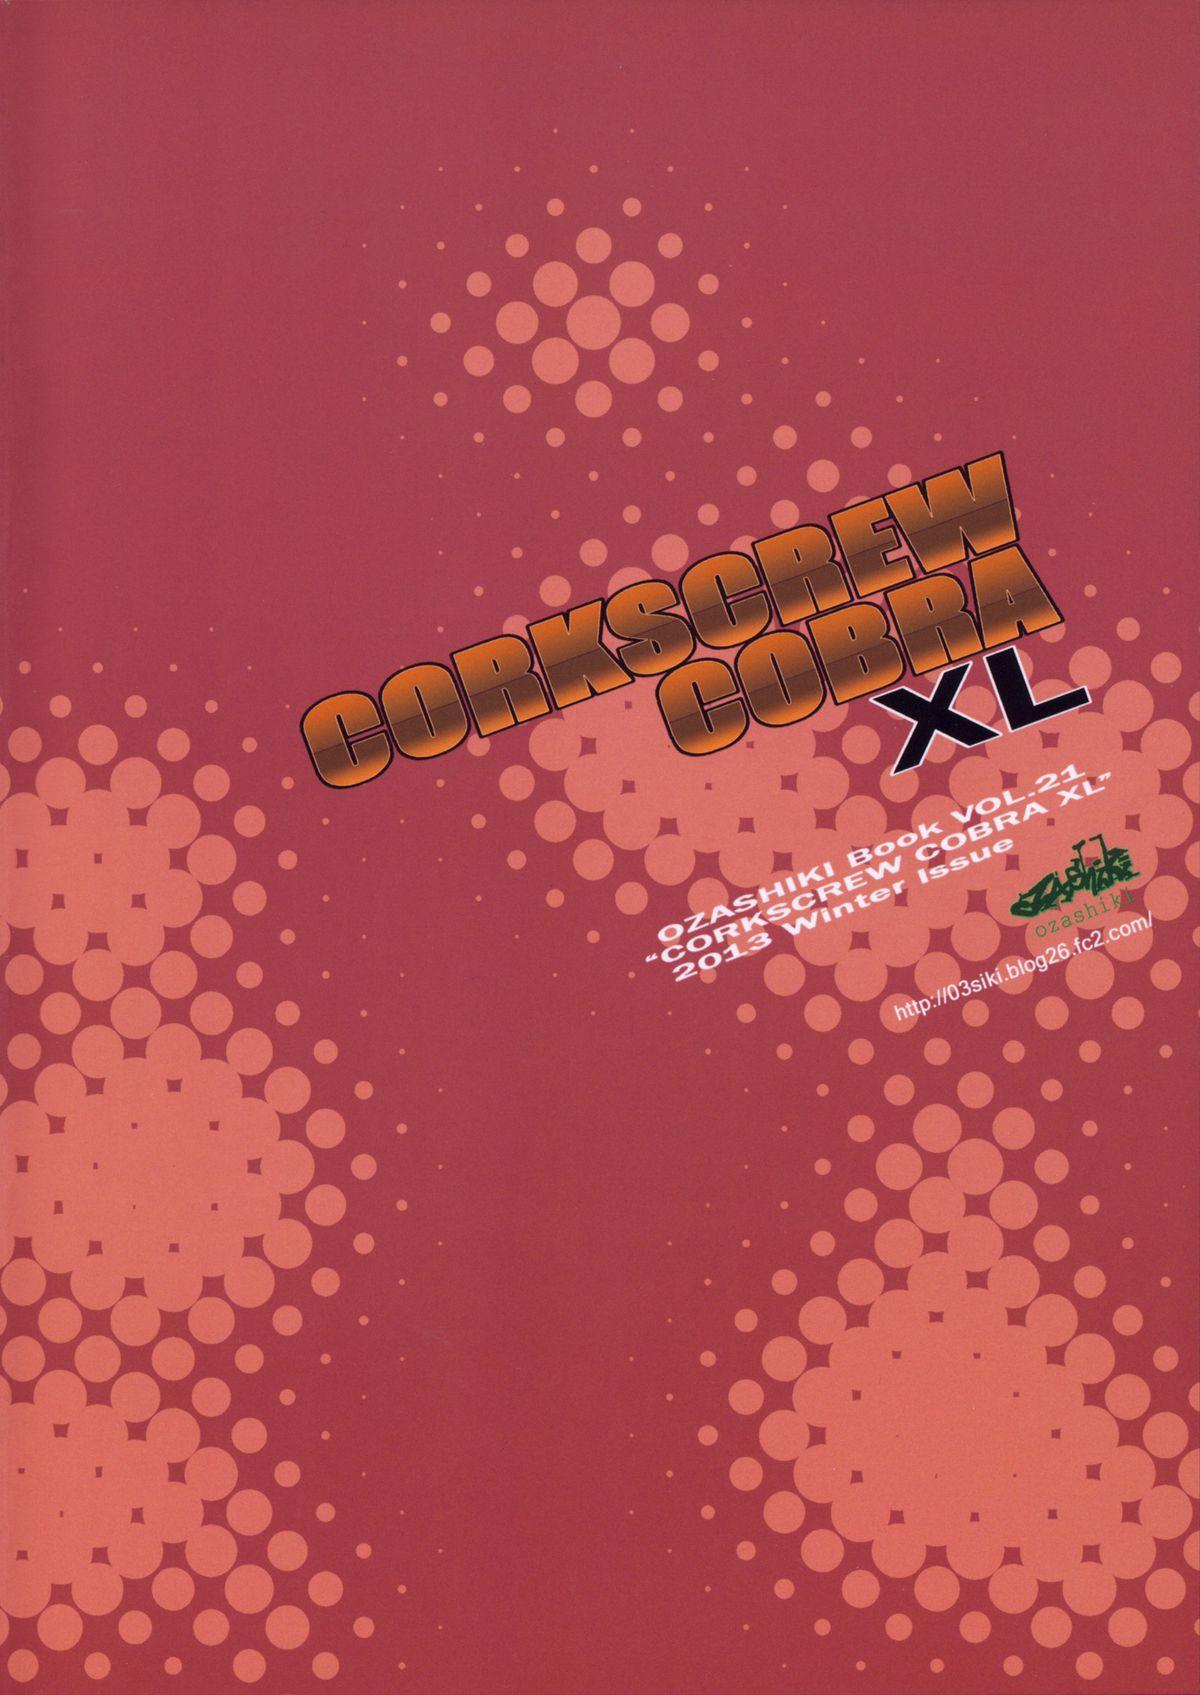 CORKSCREW COBRA XL 22